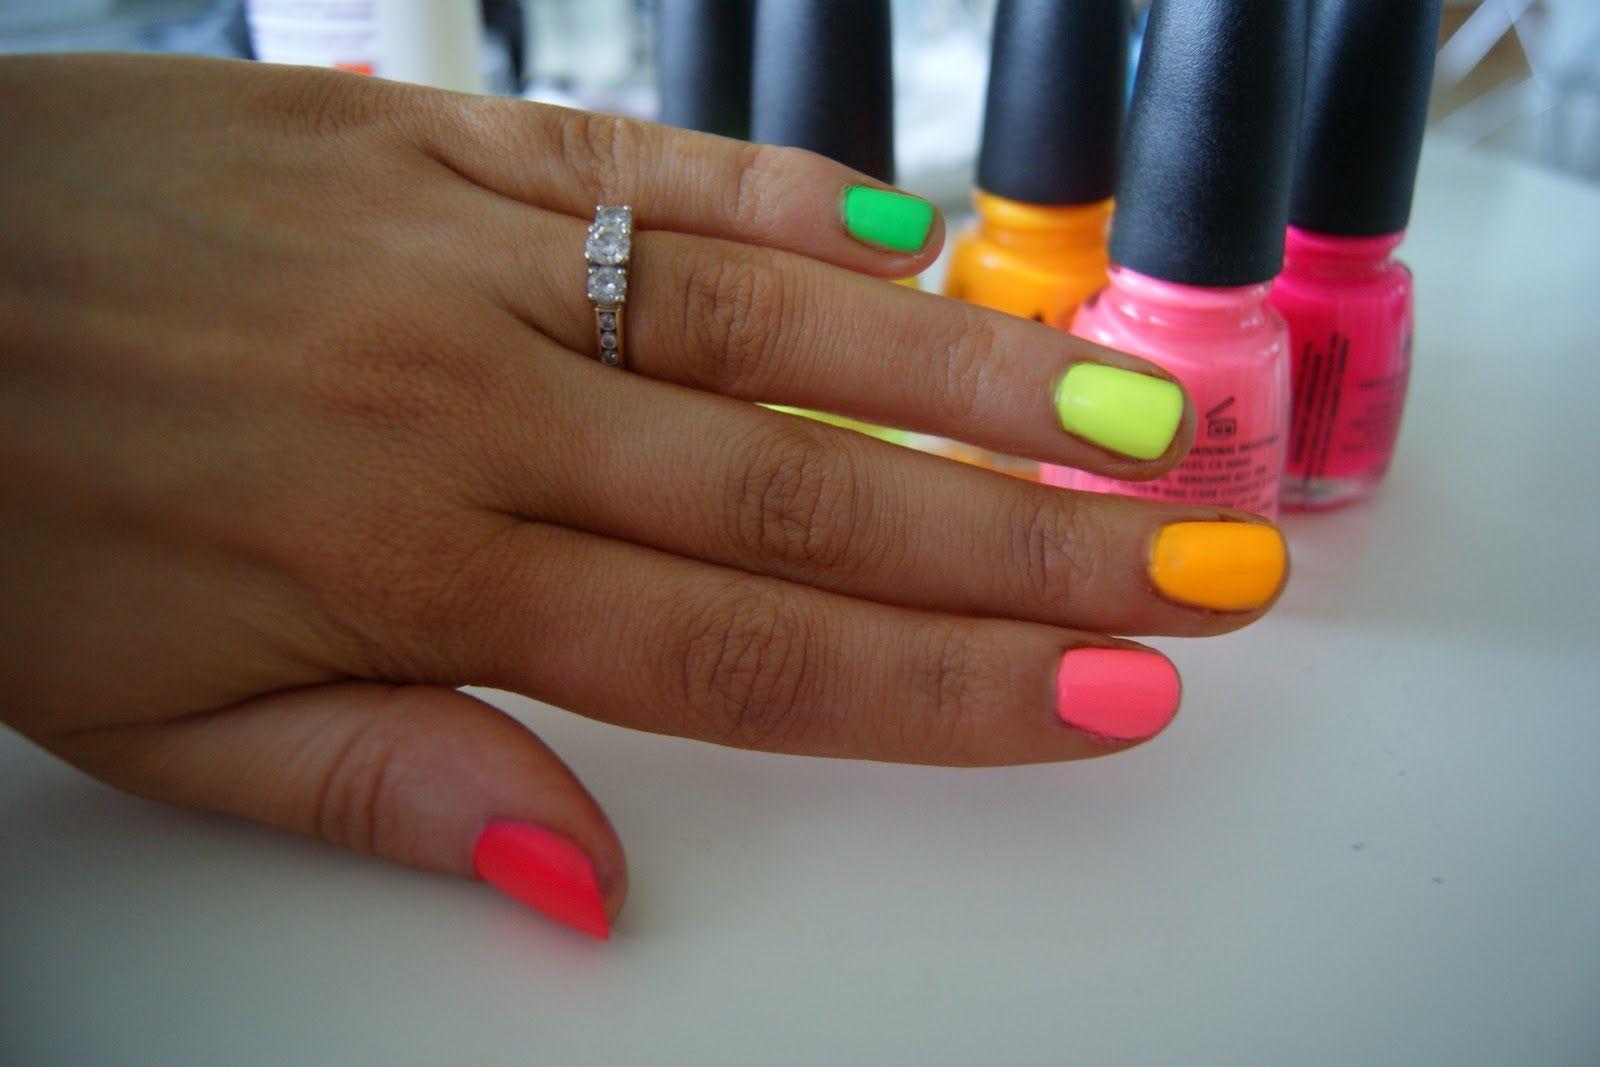 In the fashion whether neon nail polish